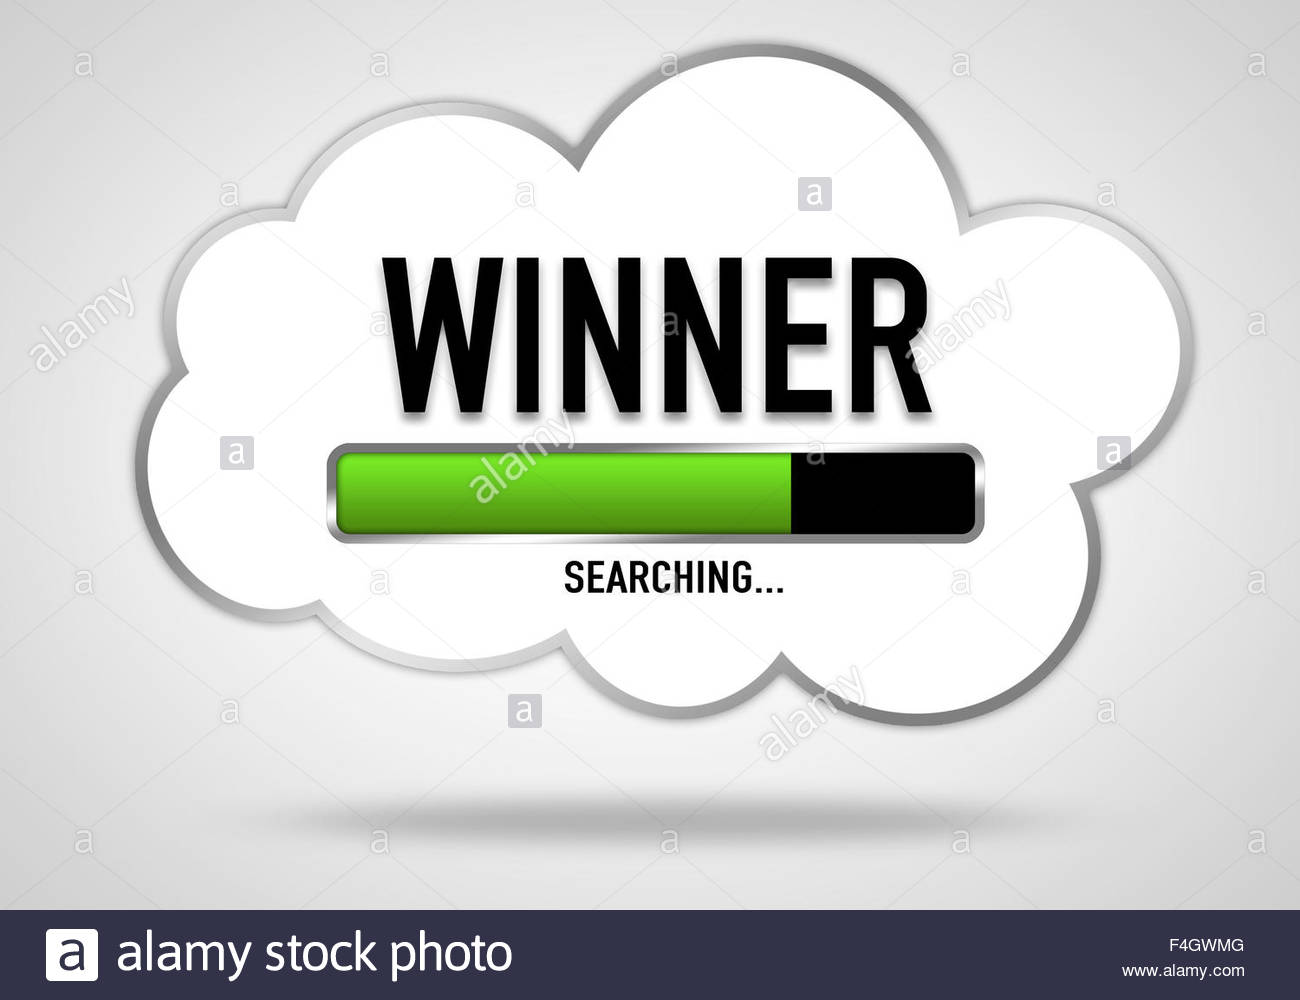 THE WINNER - Stock Image